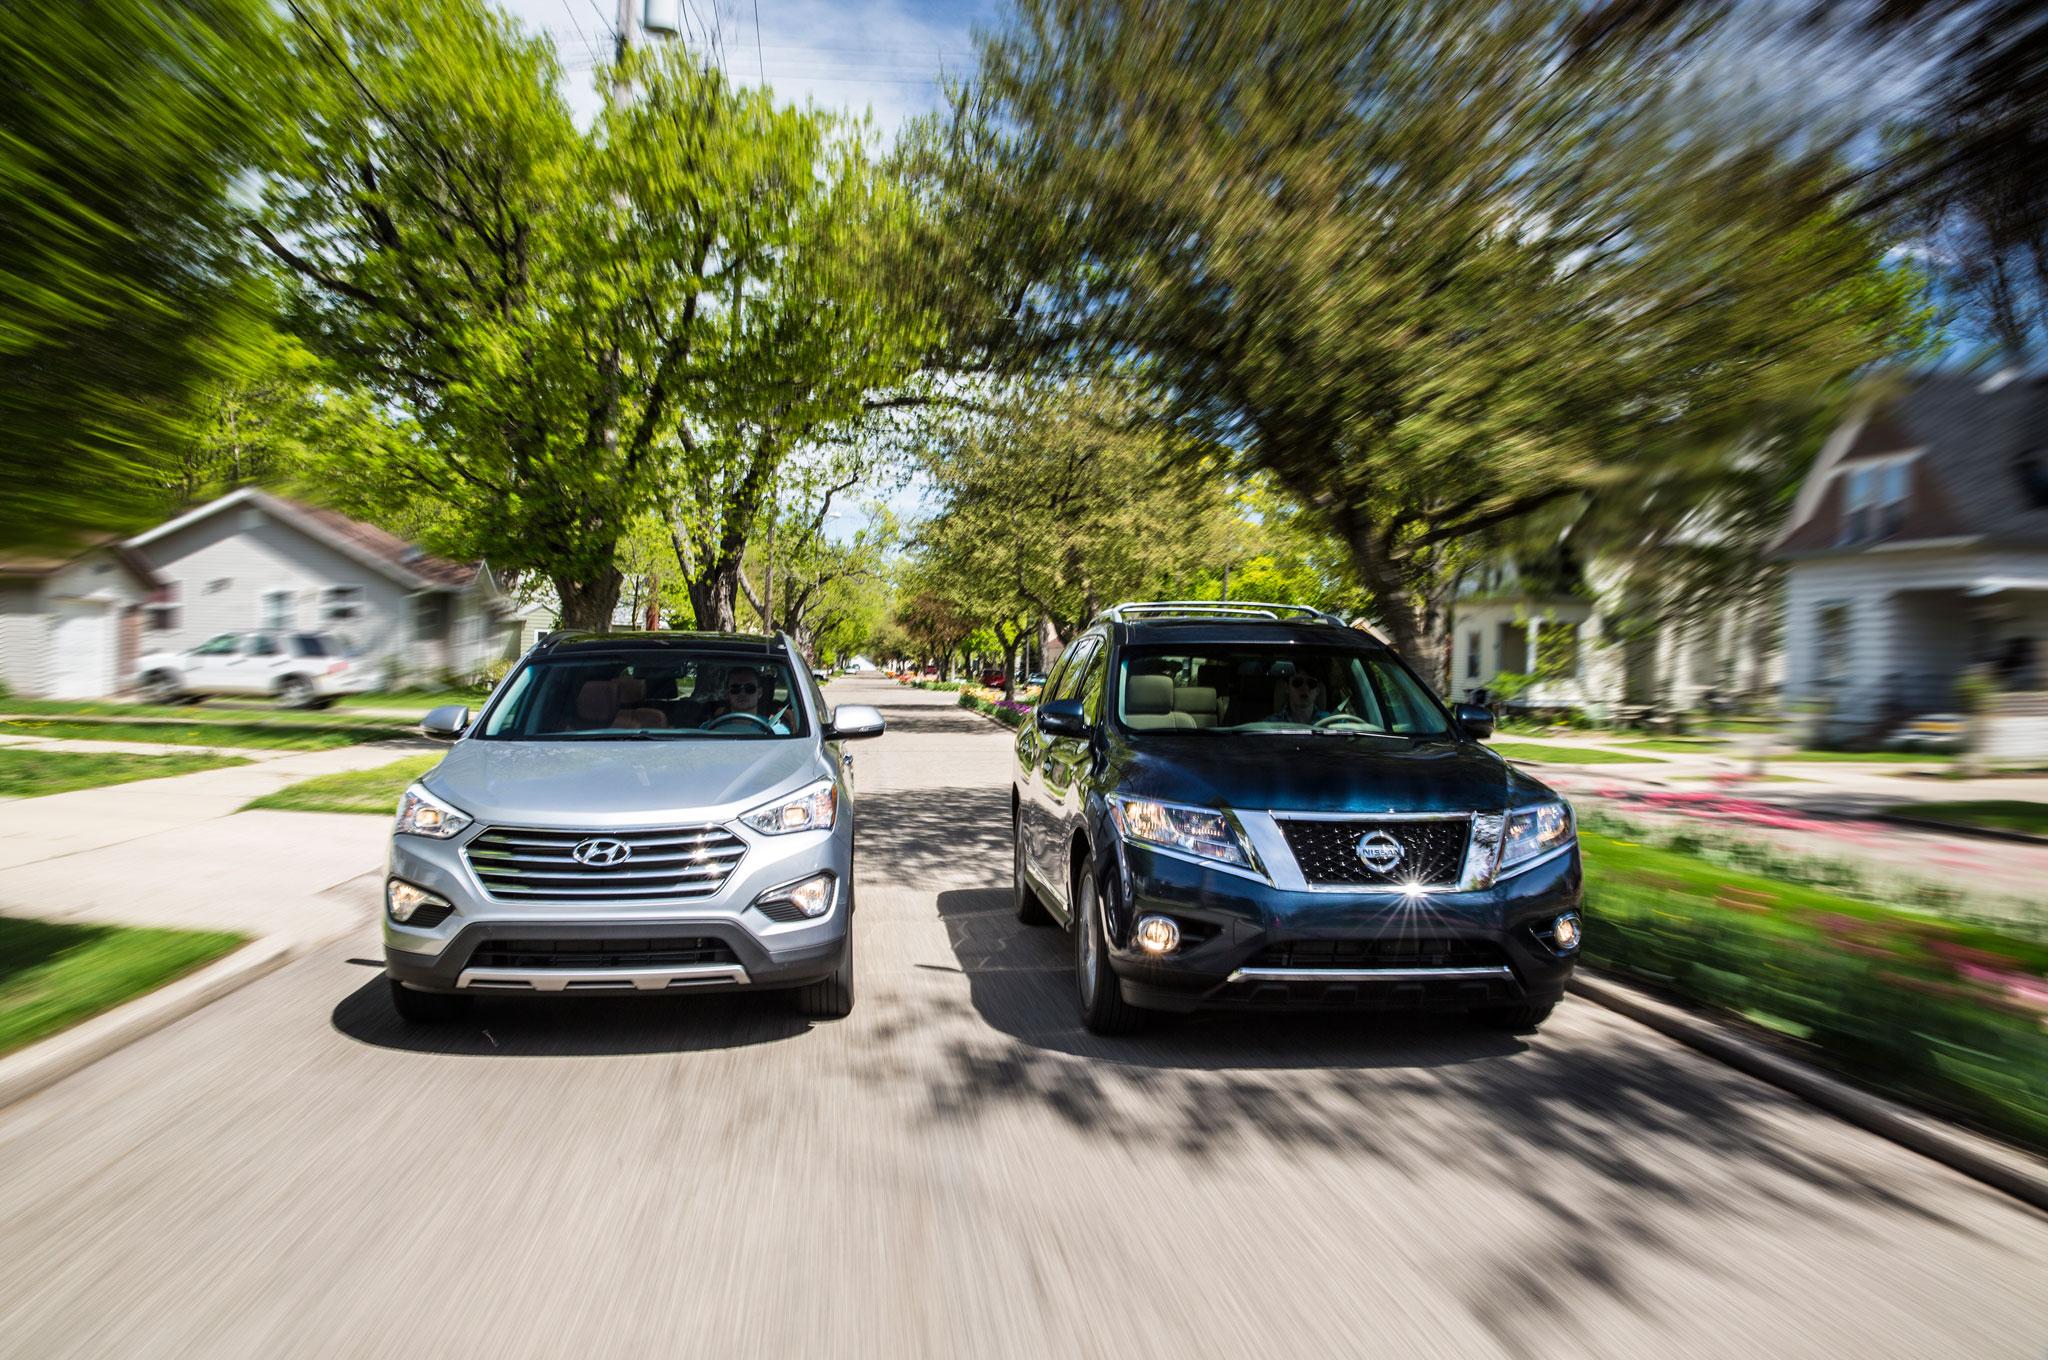 2013 Hyundai Santa Fe Vs 2013 Nissan Pathfinder Platinum 4WD Front View1